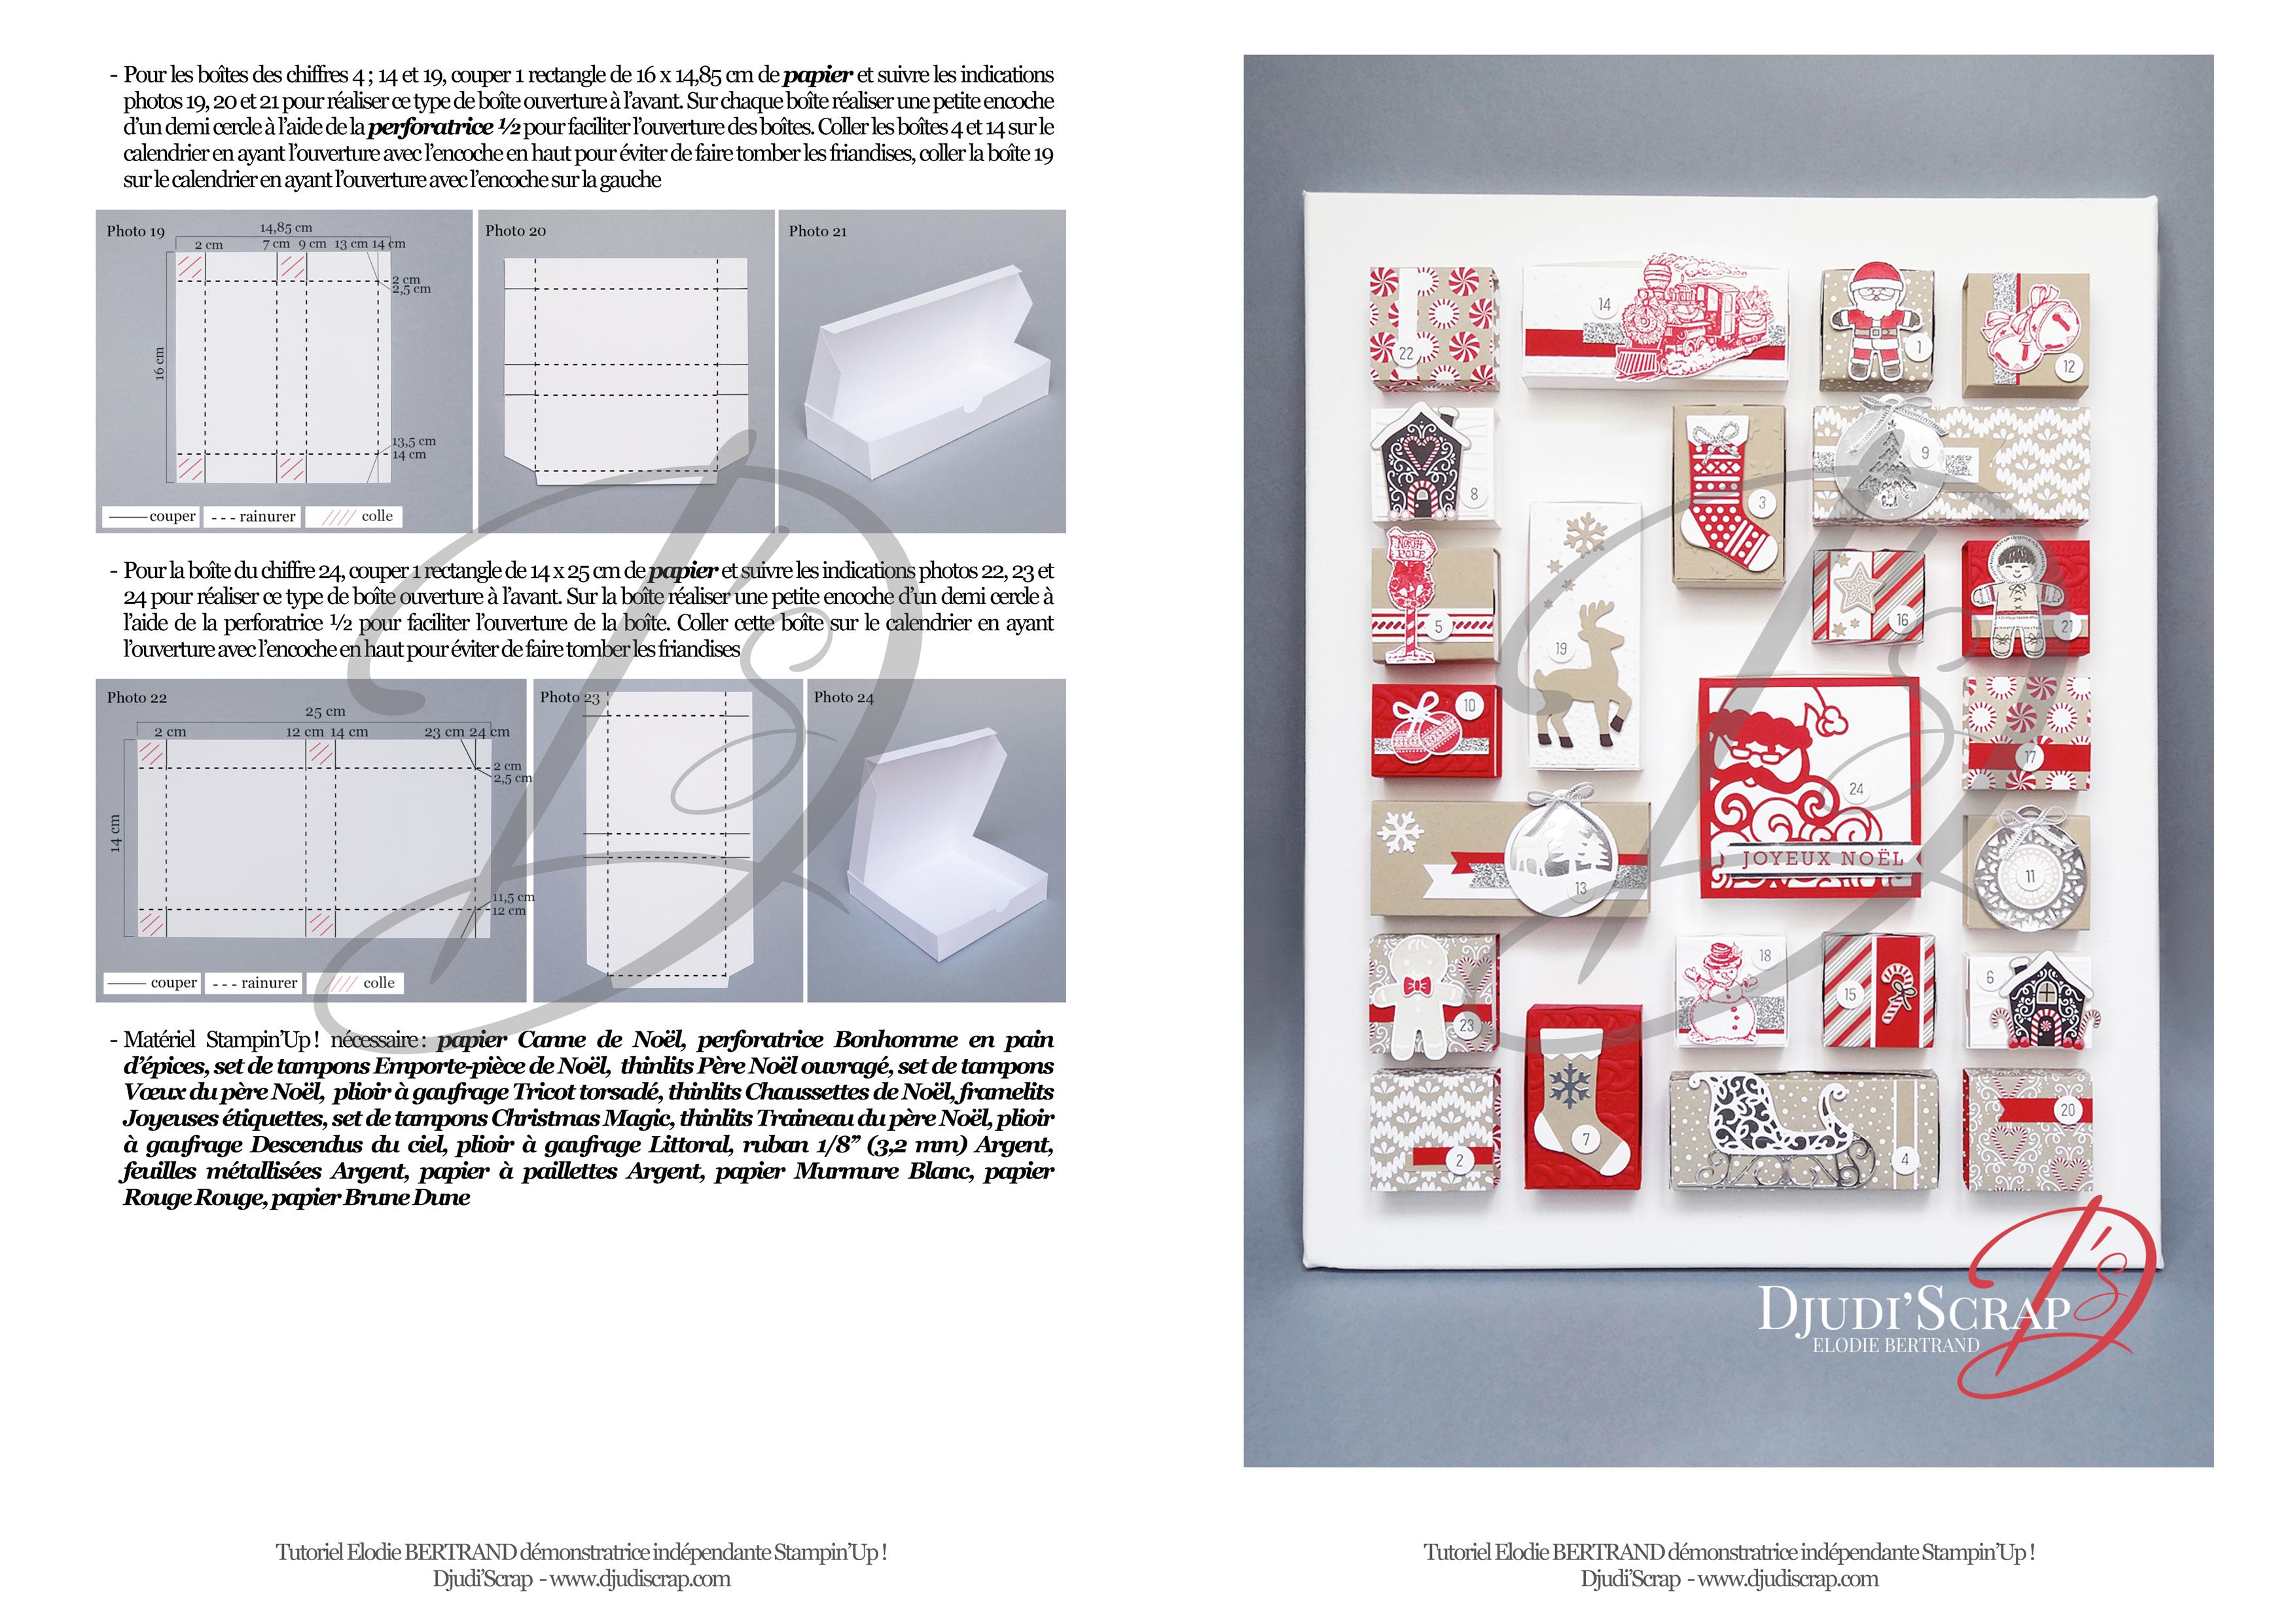 tutoriel-djudiscrap-calendrier-de-lavent-2016-partie-2